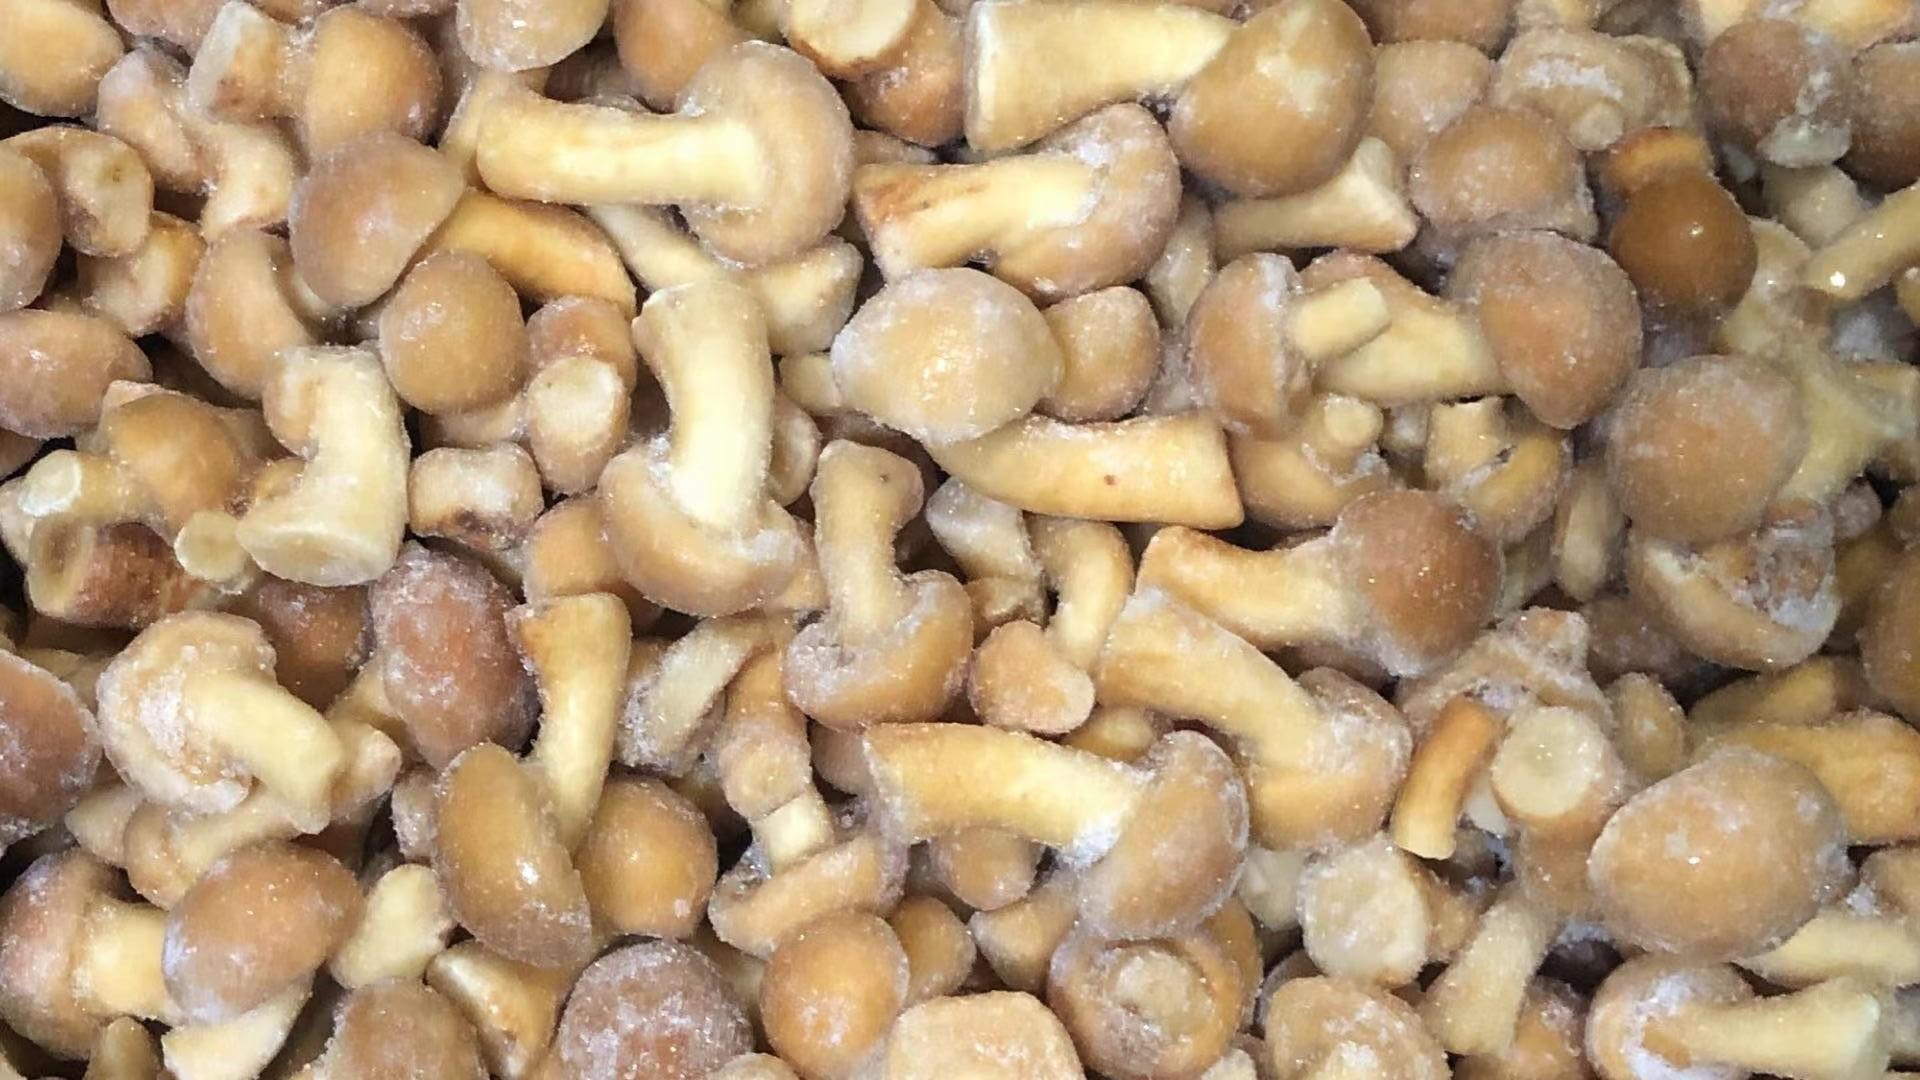 IQF Mixed Mushrooms,Frozen Mixed Mushrooms,Mushrooms Blend,Wild Mushrooms Blend 12